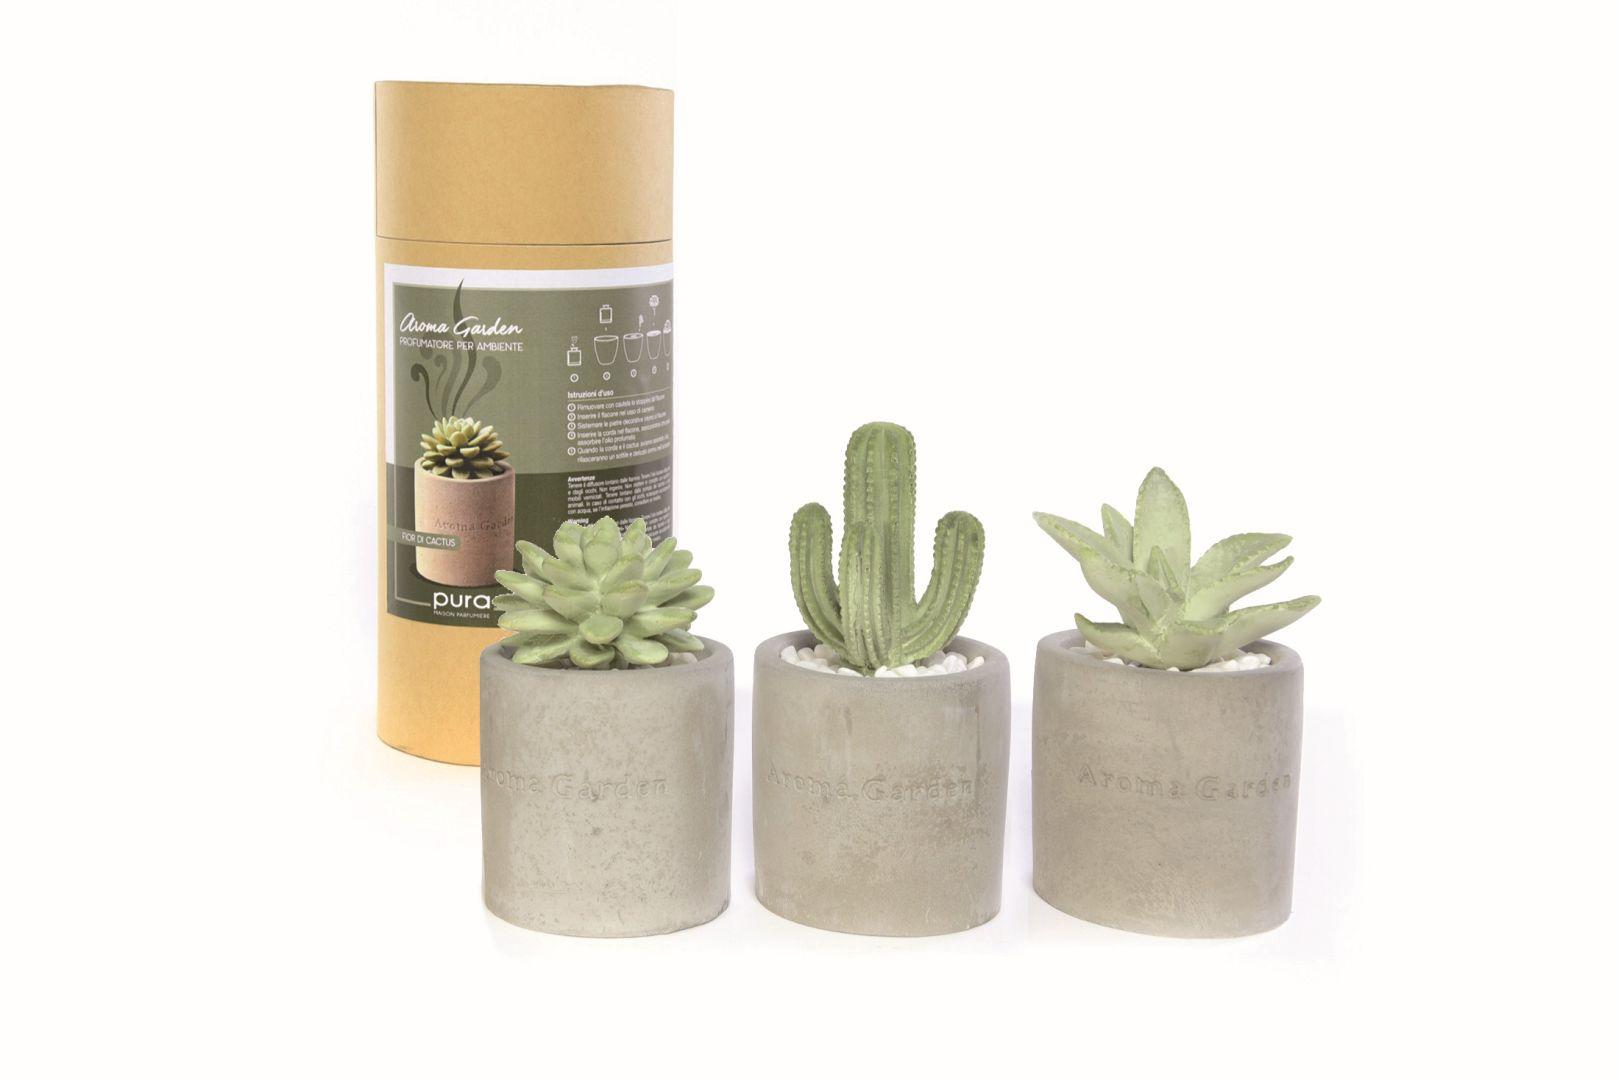 profumatori ambiente pura forma di cactus